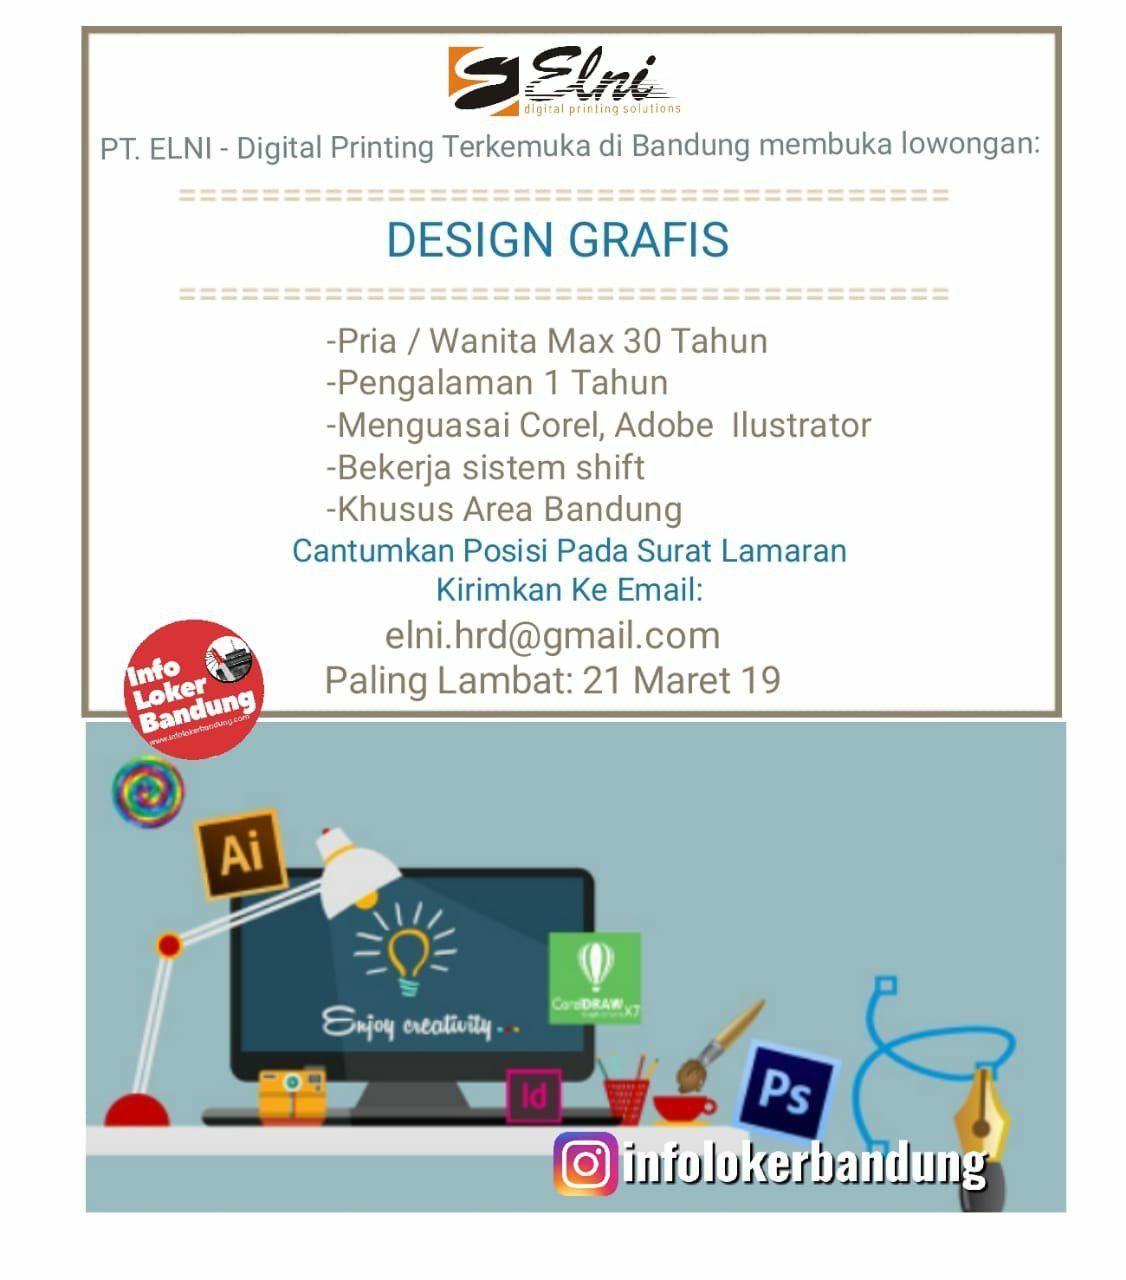 Lowongan Kerja Design Grafis Pt Elni Bandung Maret 2019 Grafis